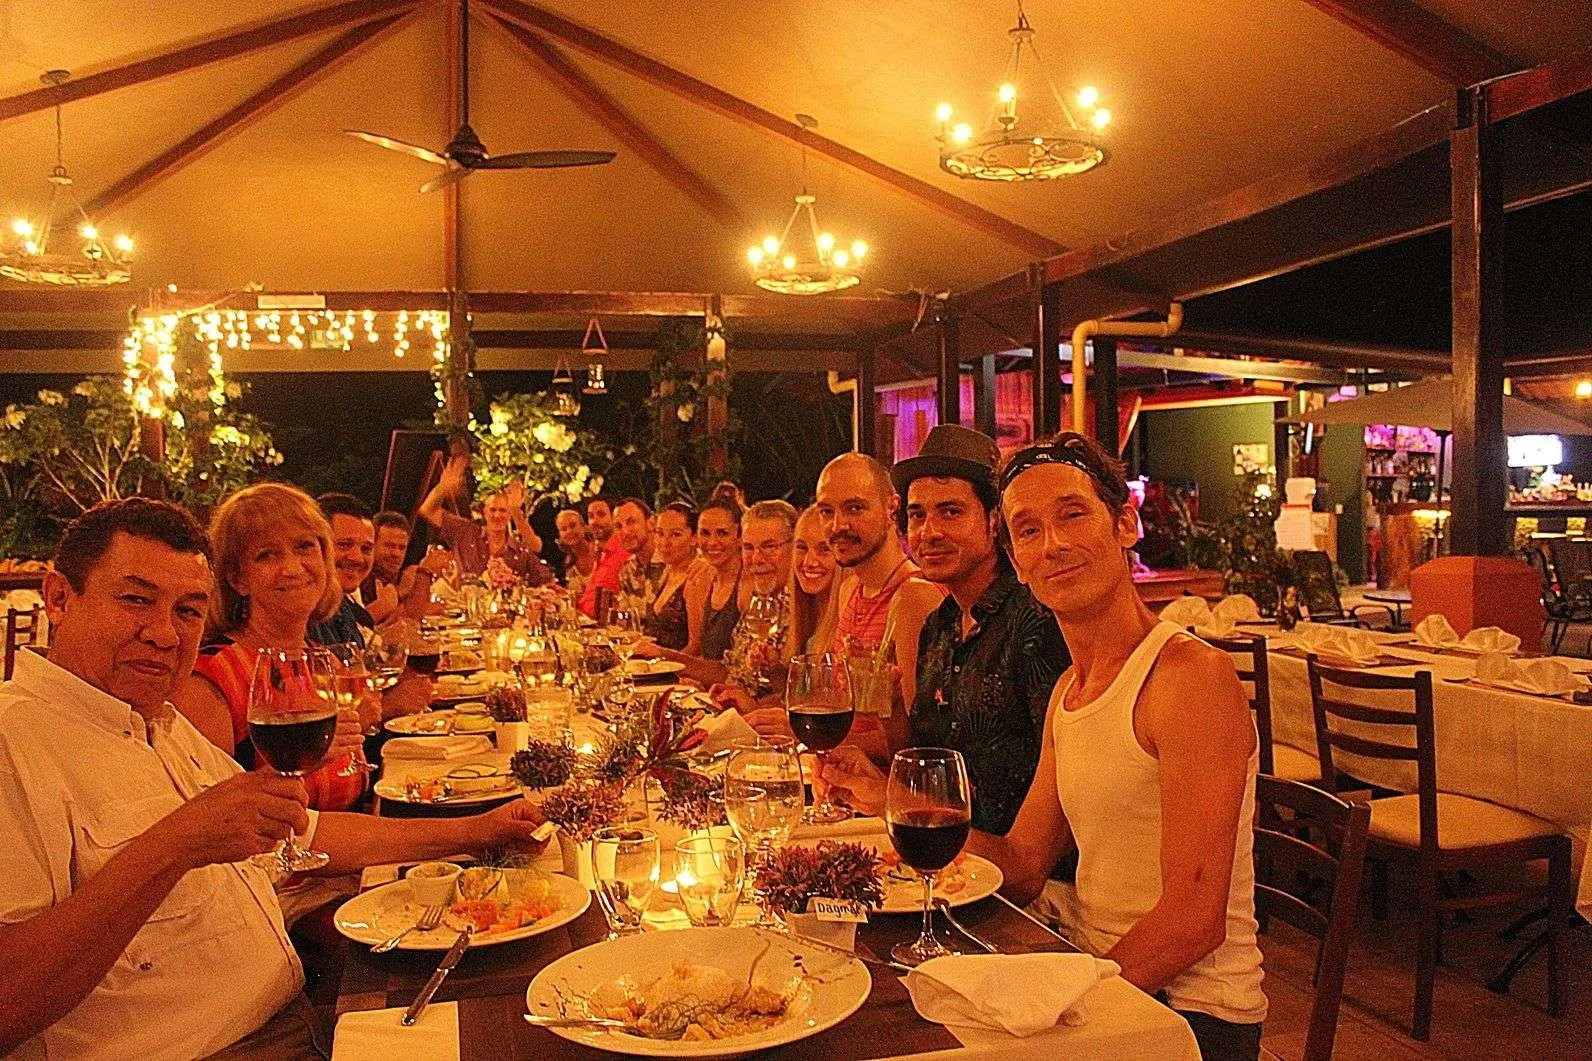 Ballena Tales Team, Costa Rica Travel Guide